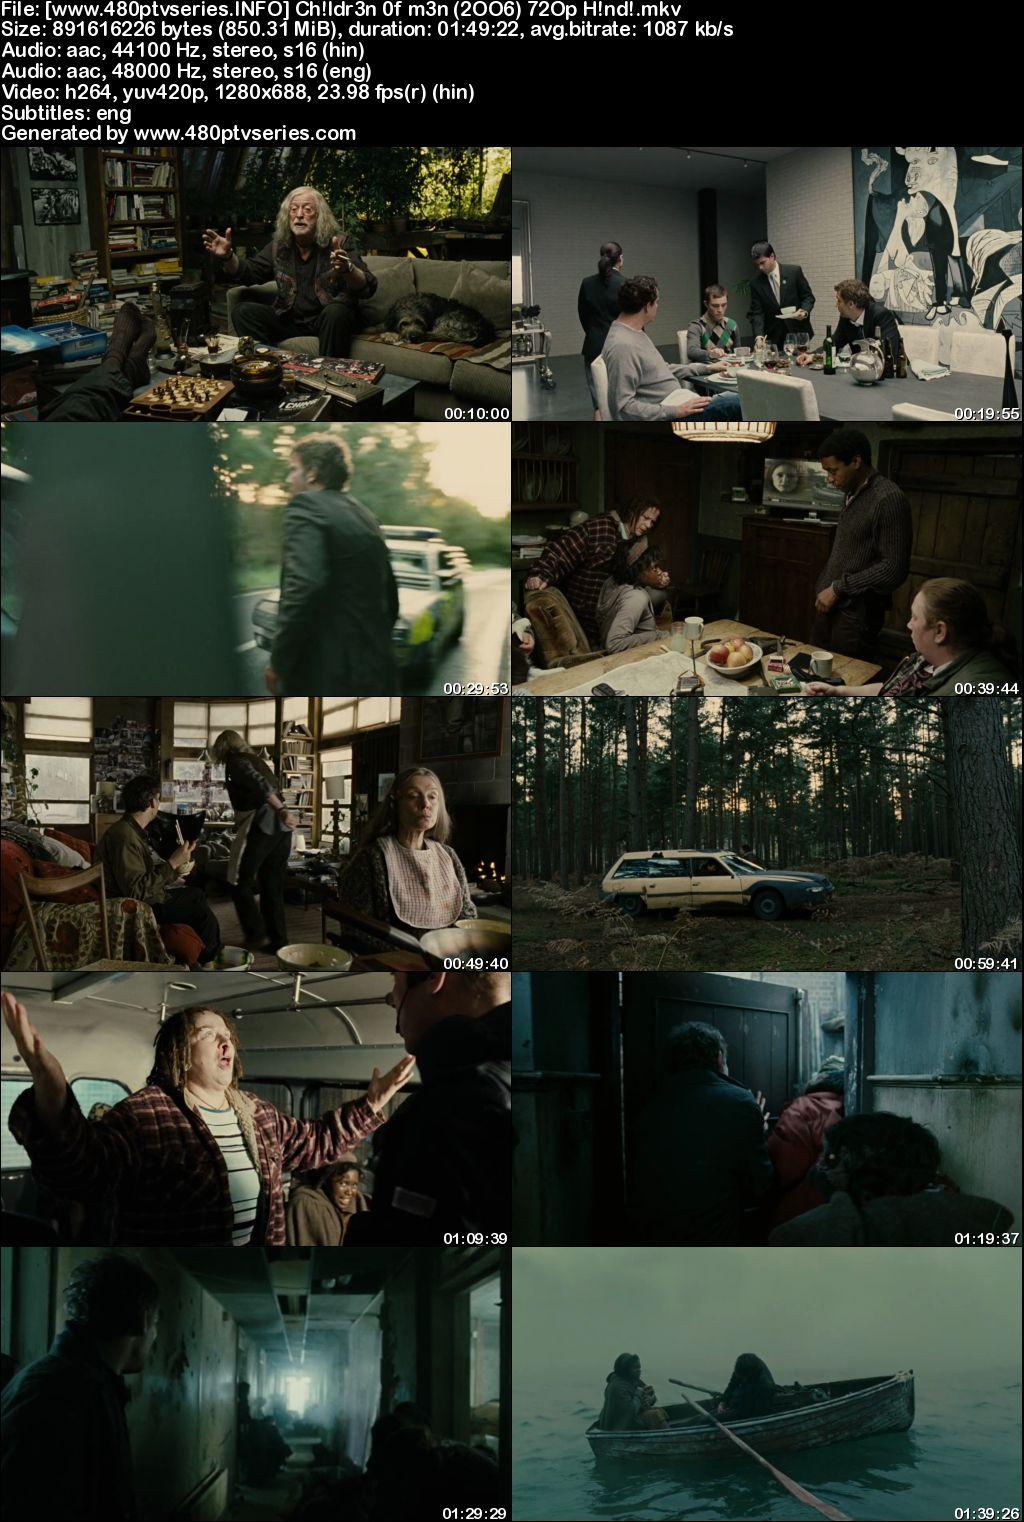 Download Children of Men (2006) 850MB Full Hindi Dual Audio Movie Download 720p Bluray Free Watch Online Full Movie Download Worldfree4u 9xmovies